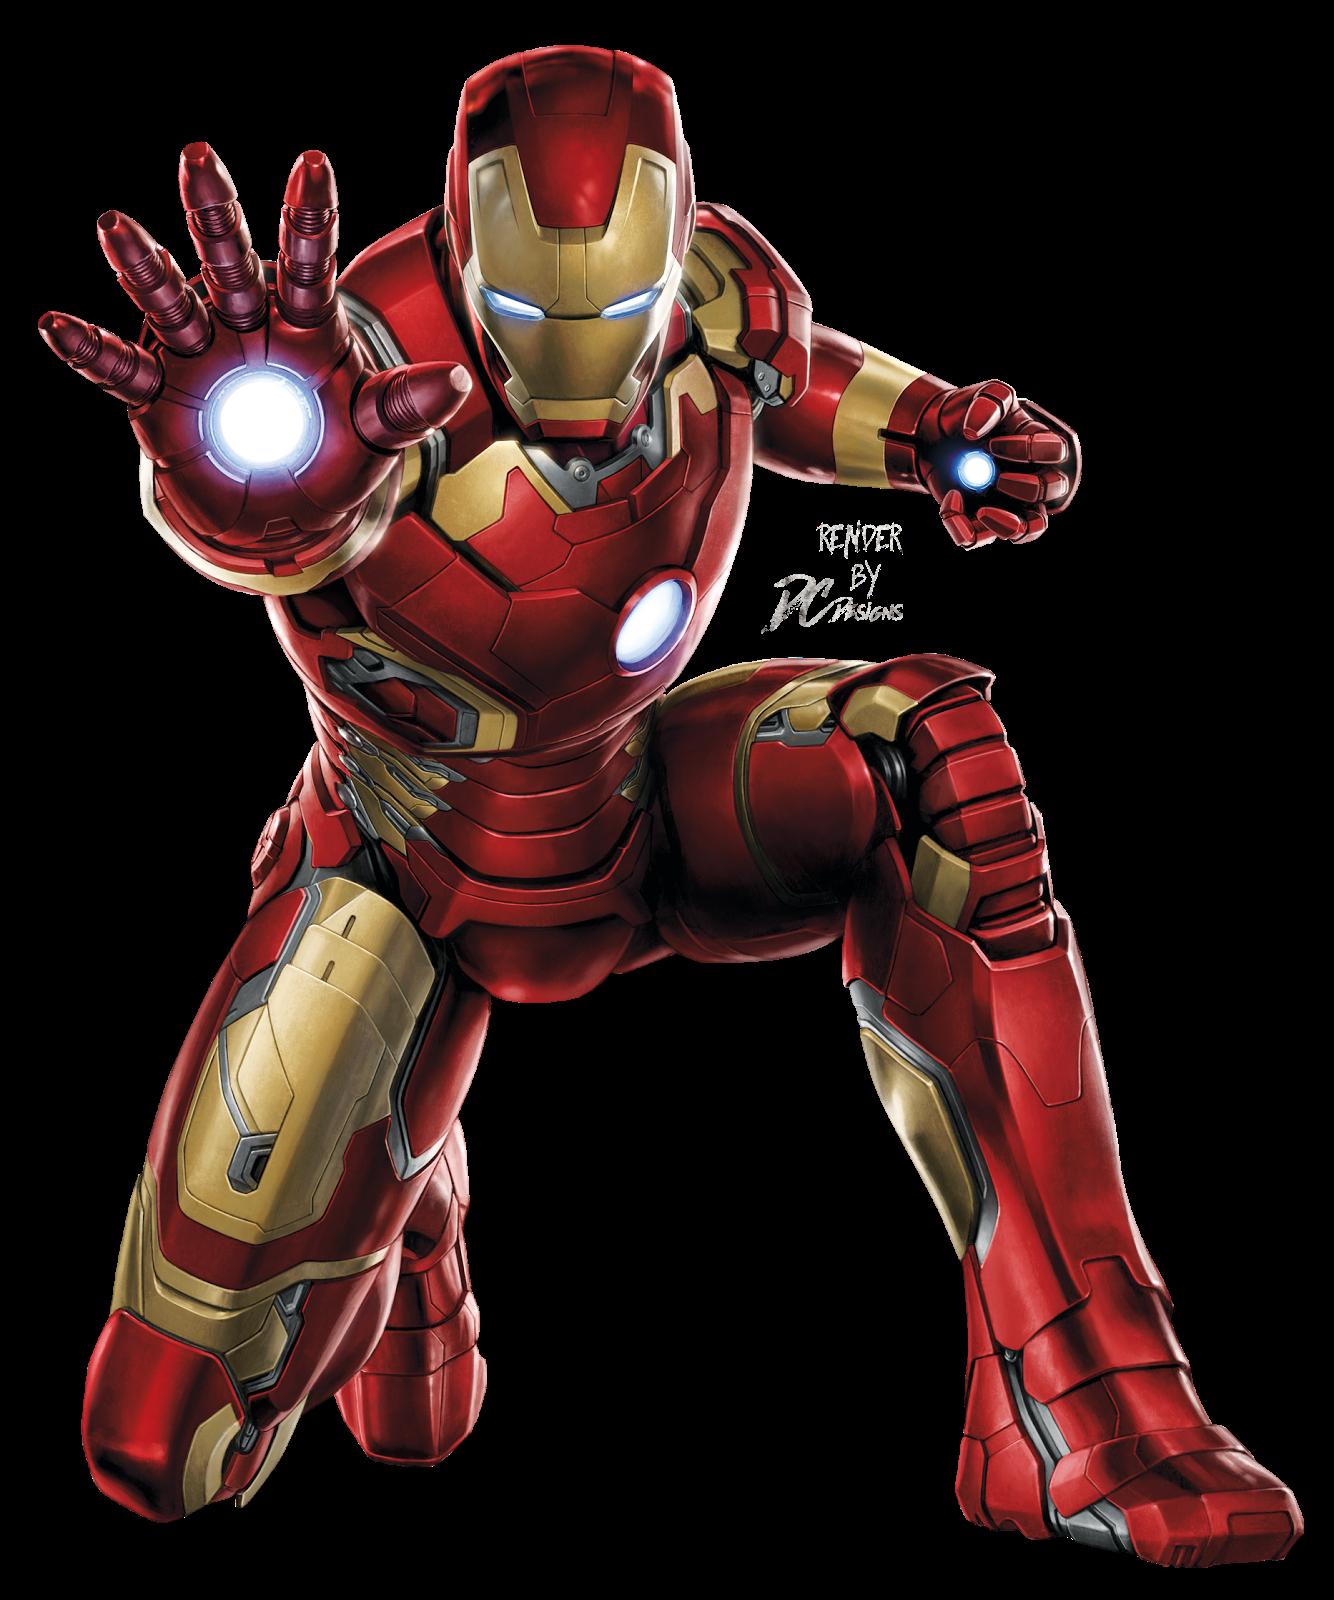 Iron Man Avengers, Iron